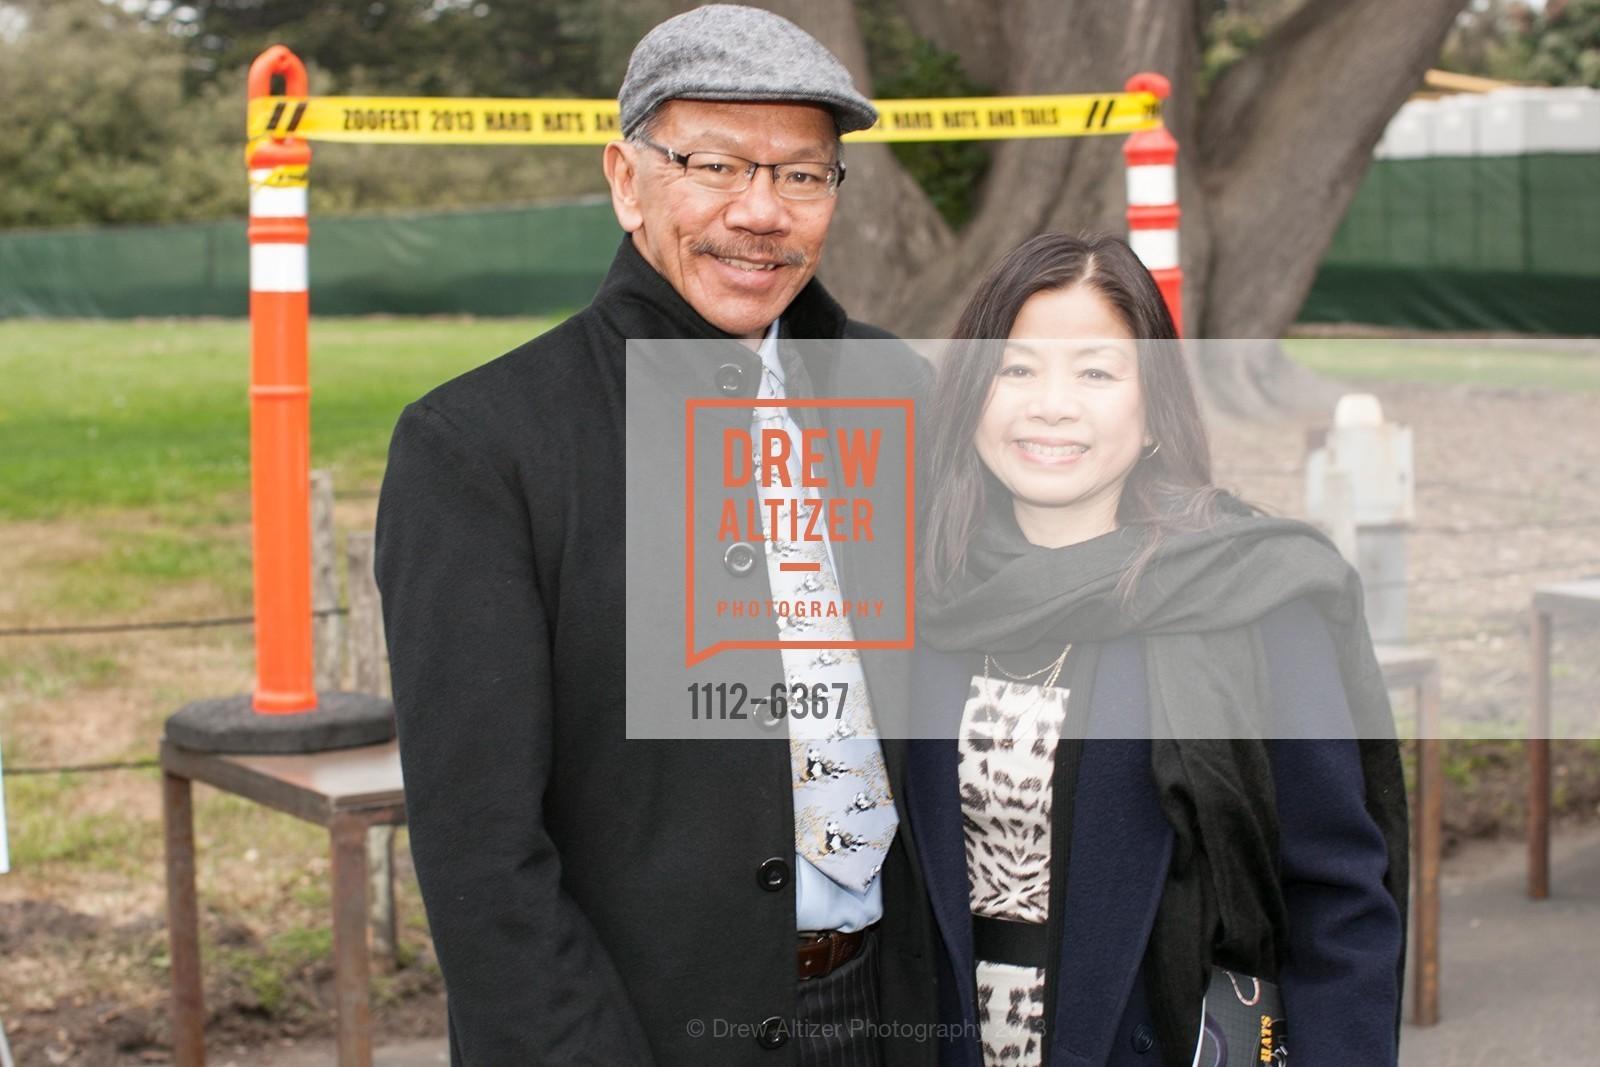 Supervisor Norman Yee, Kathy Chung, Photo #1112-6367